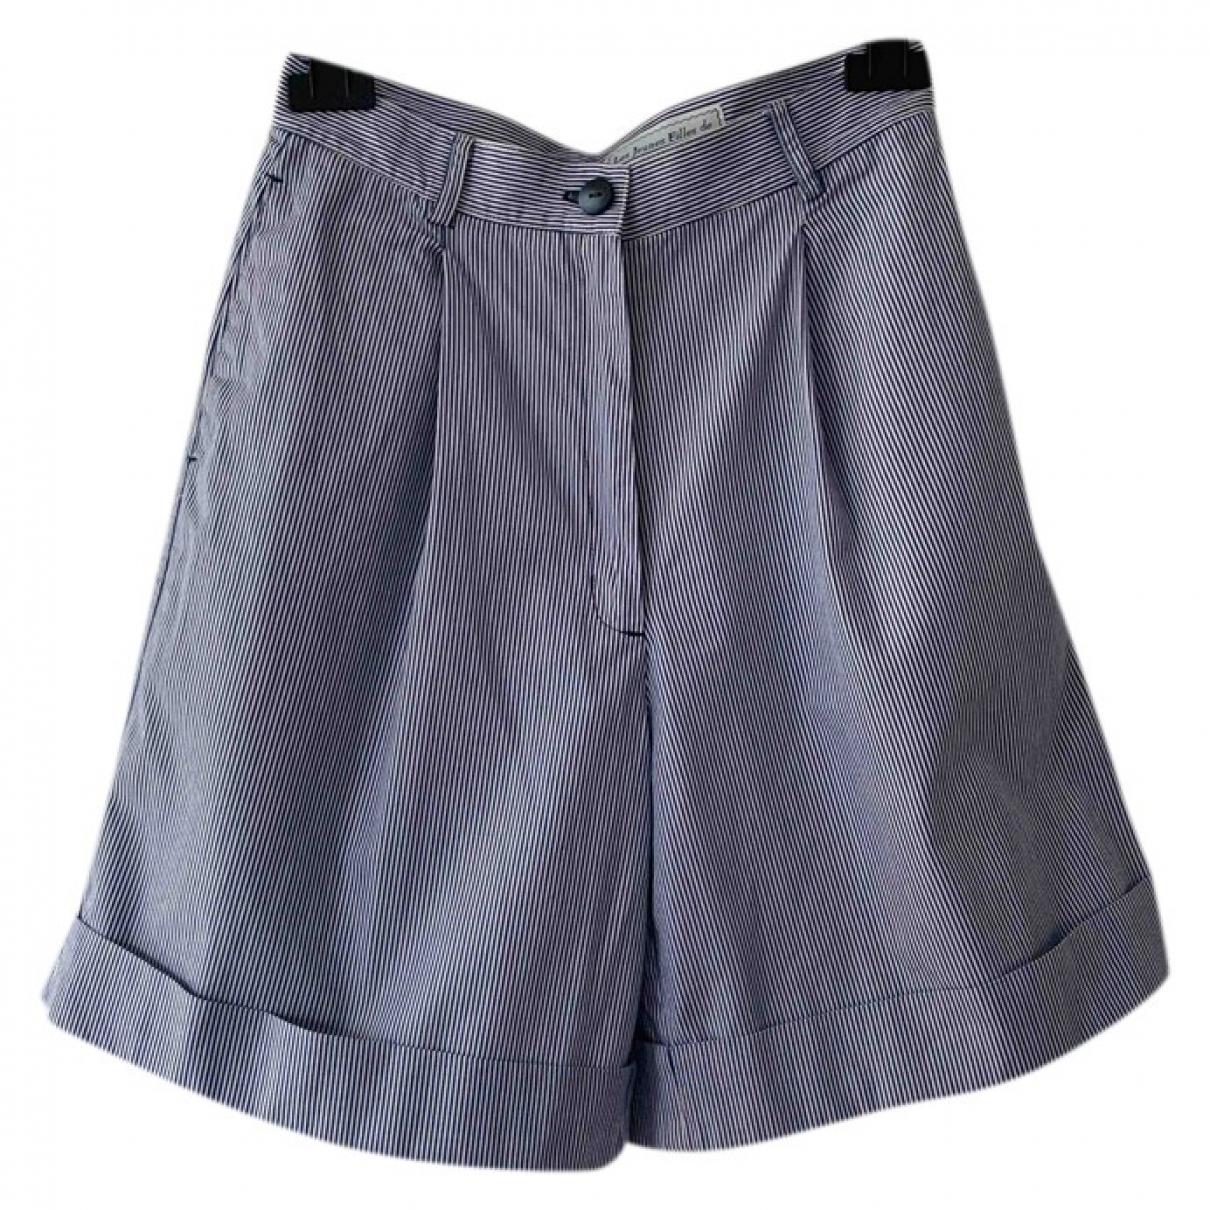 Non Signe / Unsigned Hippie Chic Shorts in  Bunt Baumwolle